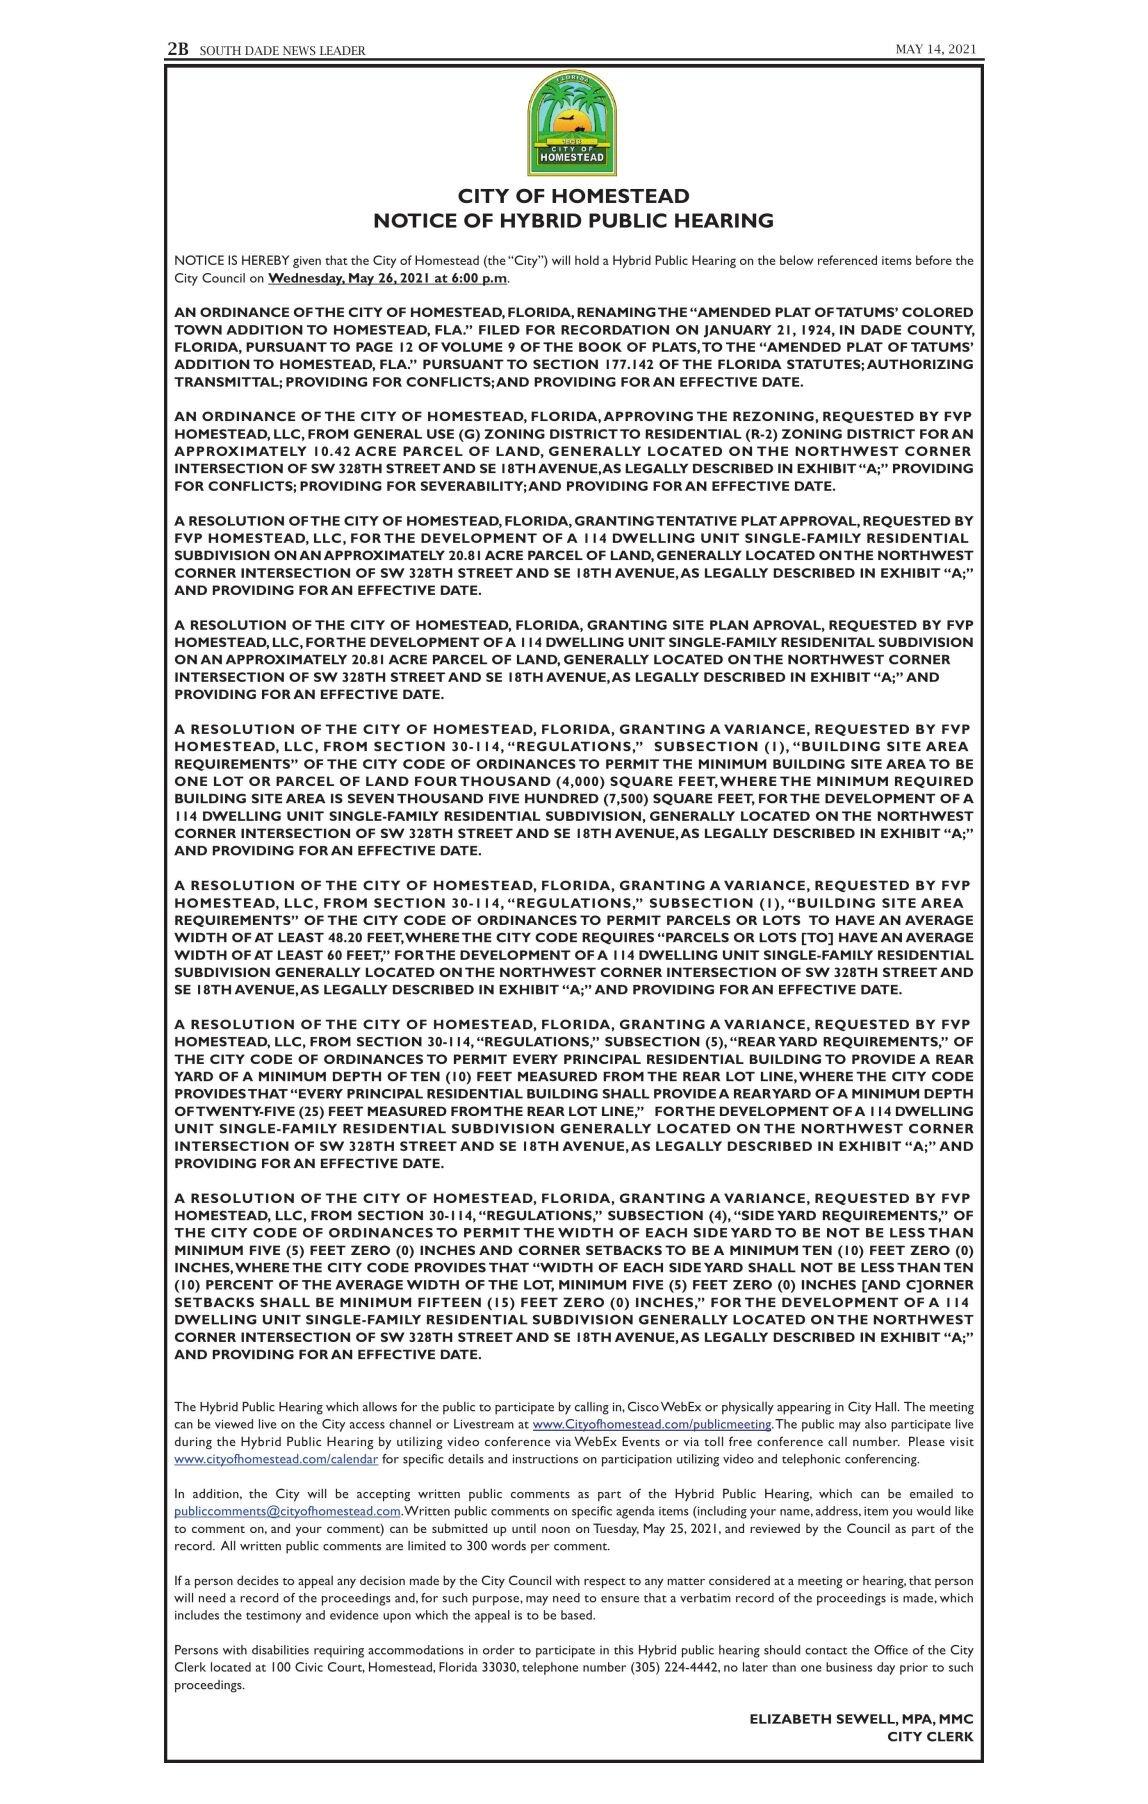 CITY OF HOMESTEAD - NOTICE OF HYBRID PUBLIC HEARING